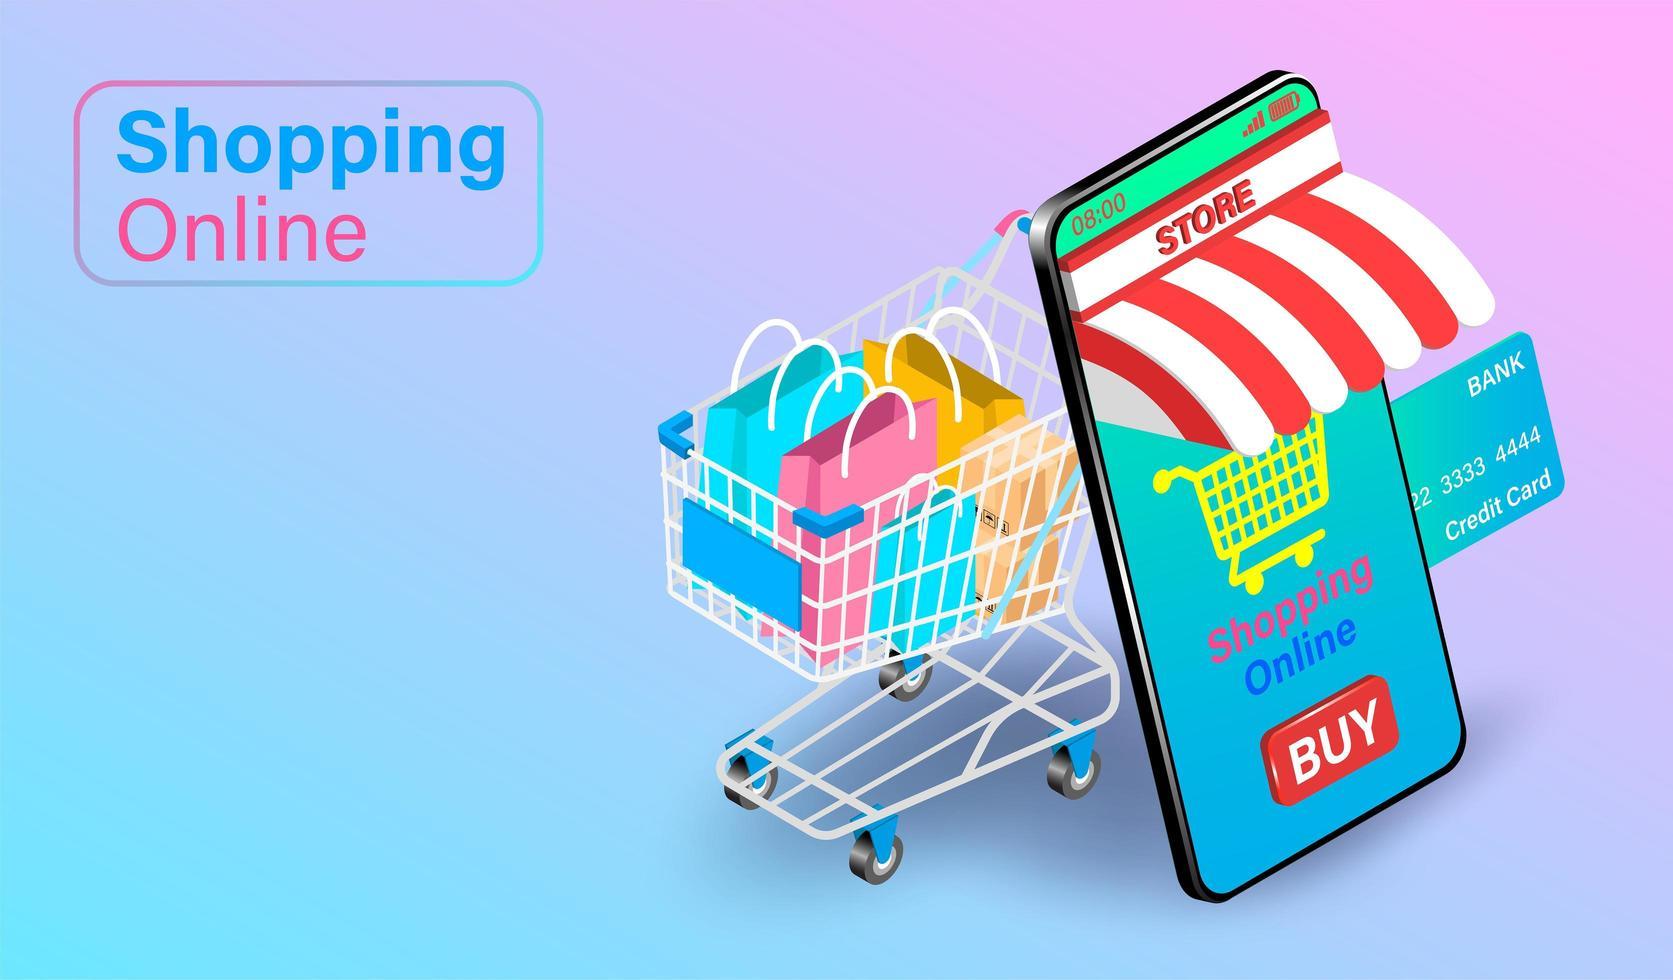 concepto de compras en línea vector